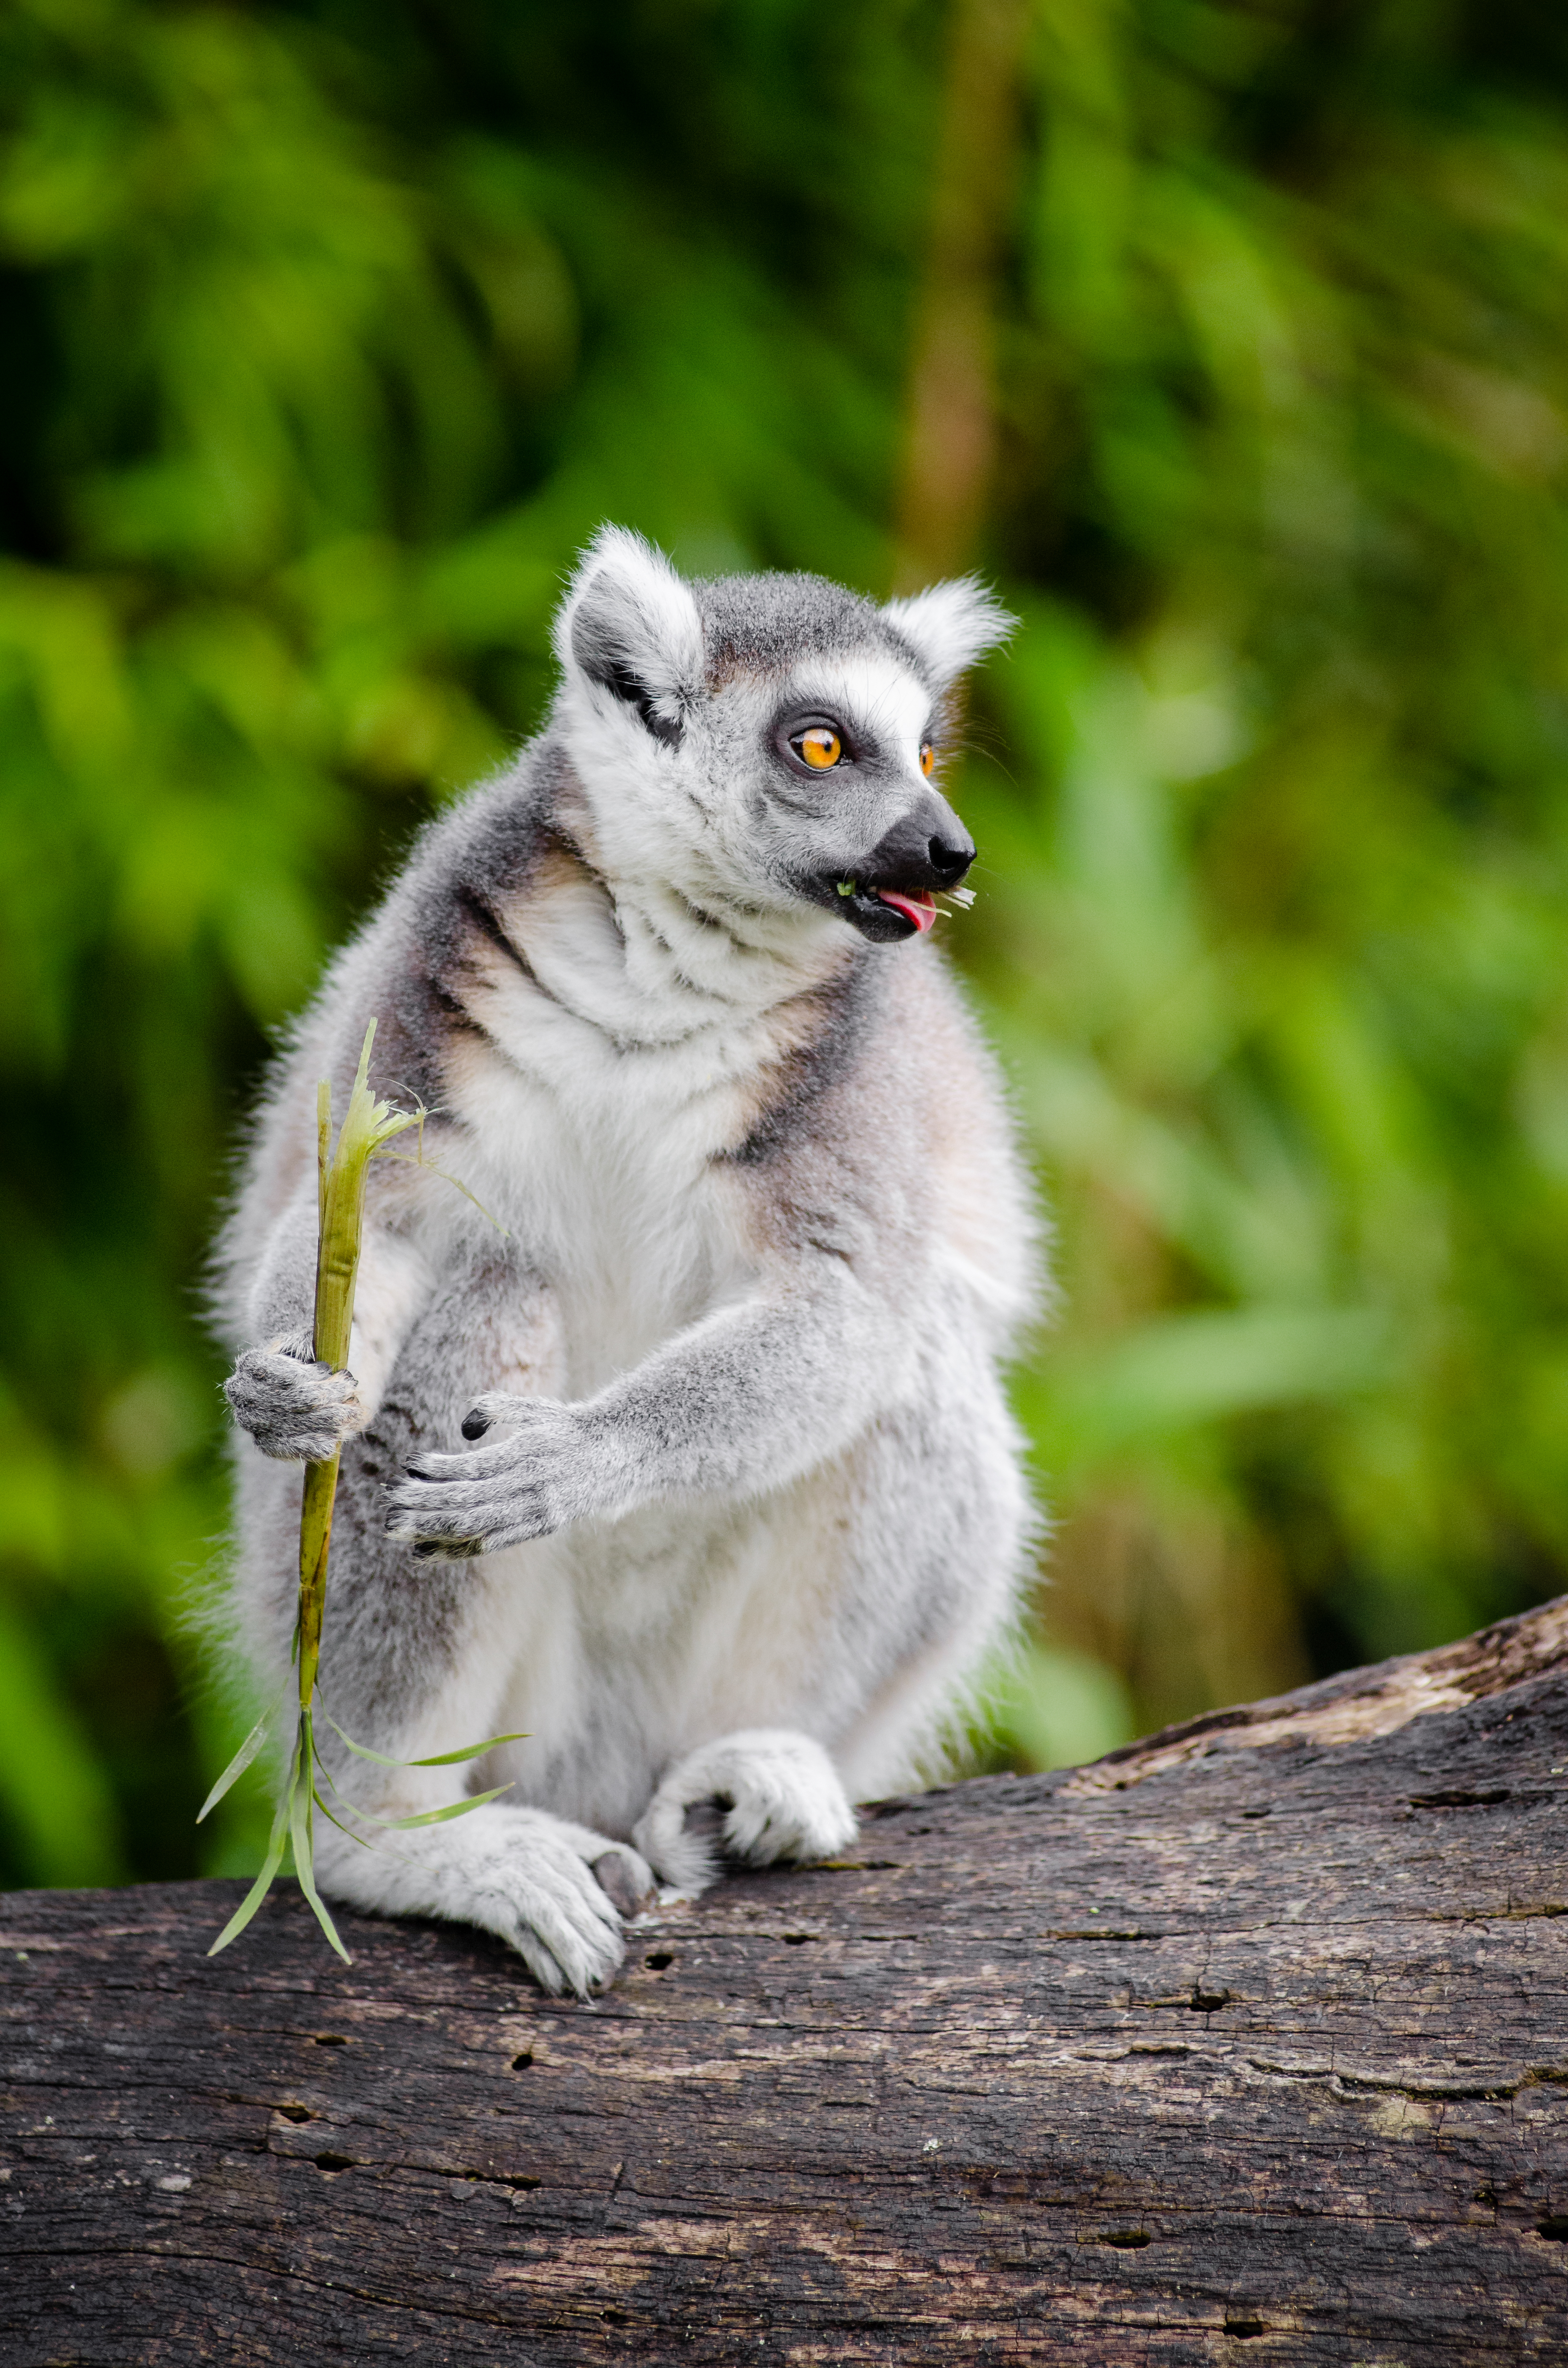 Duisburg 20160705 MAP_0724, Outdoor, Pet, Zoo, Madagascar, HQ Photo